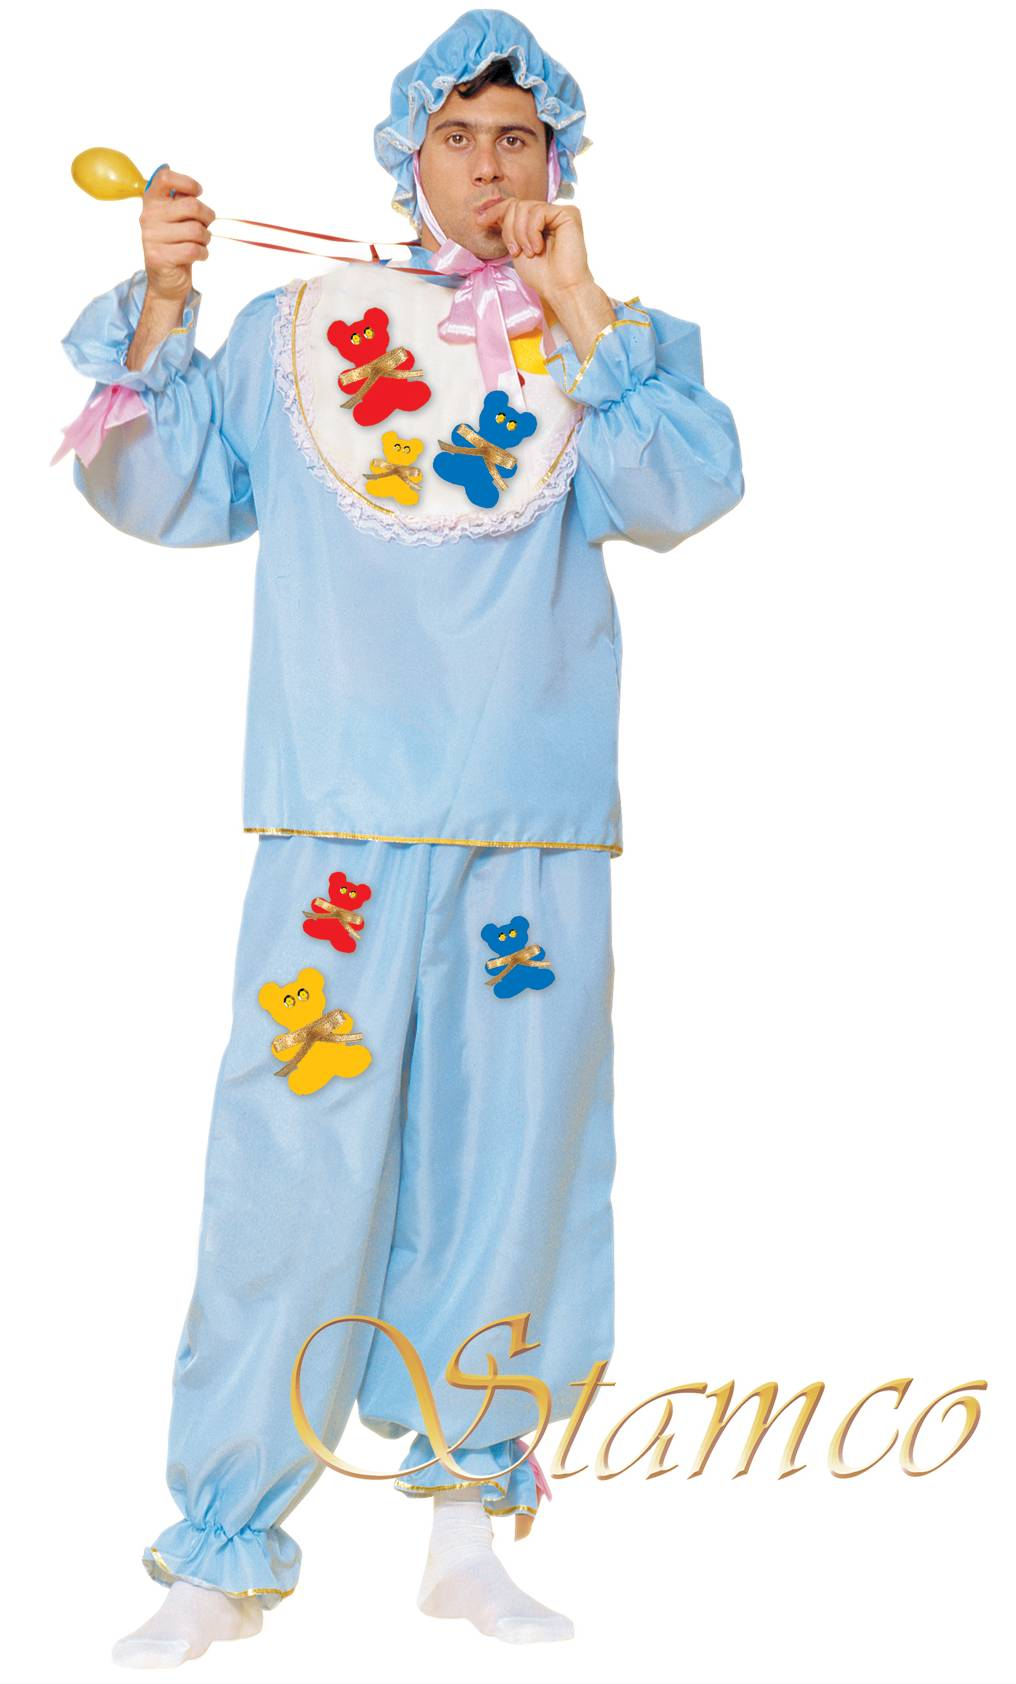 Costume-Bébé-bleu-Adulte